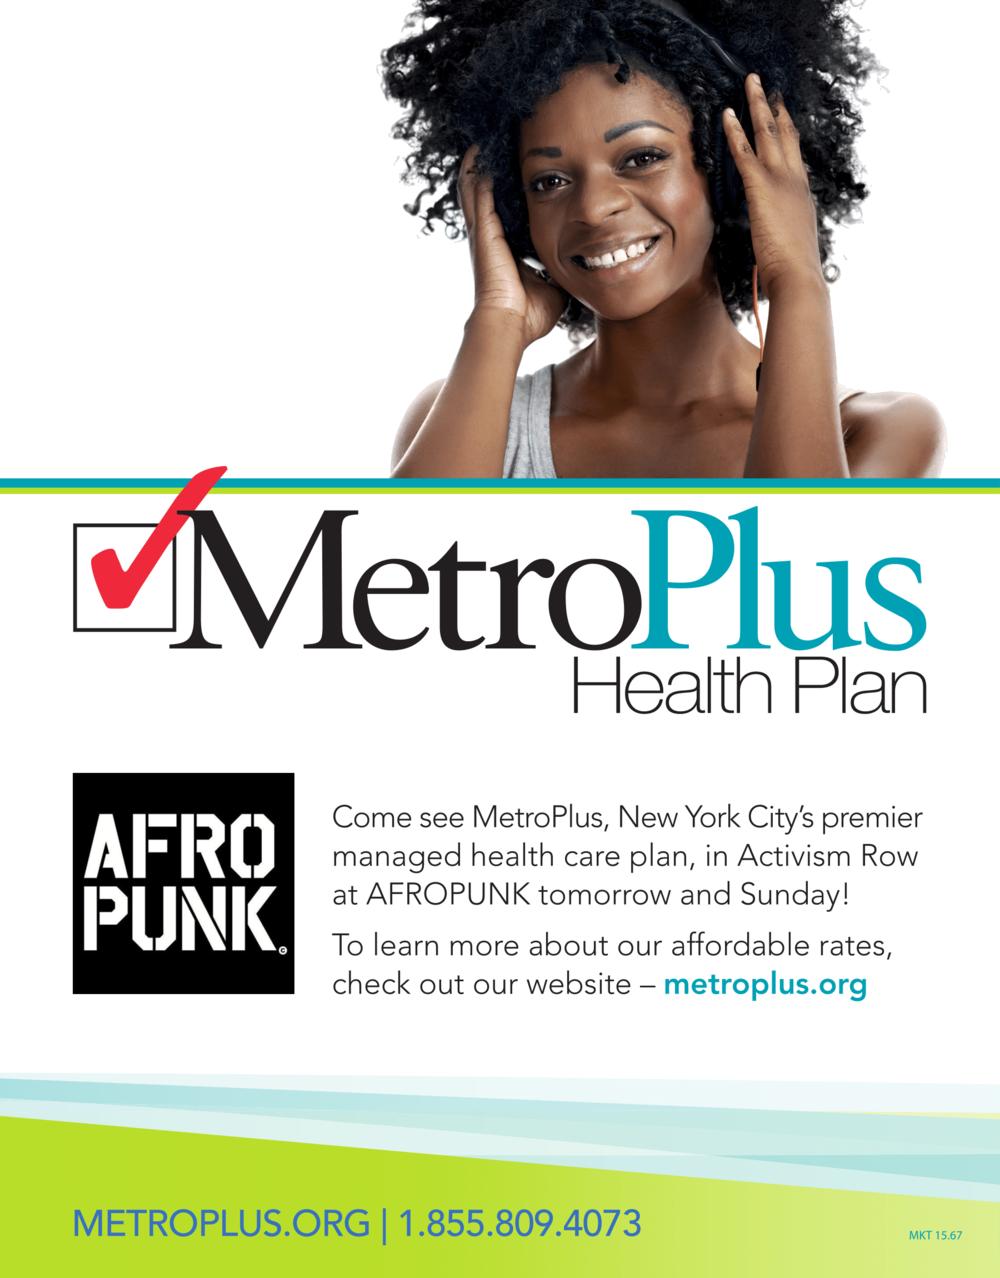 Metroplus_afropunk-1.png